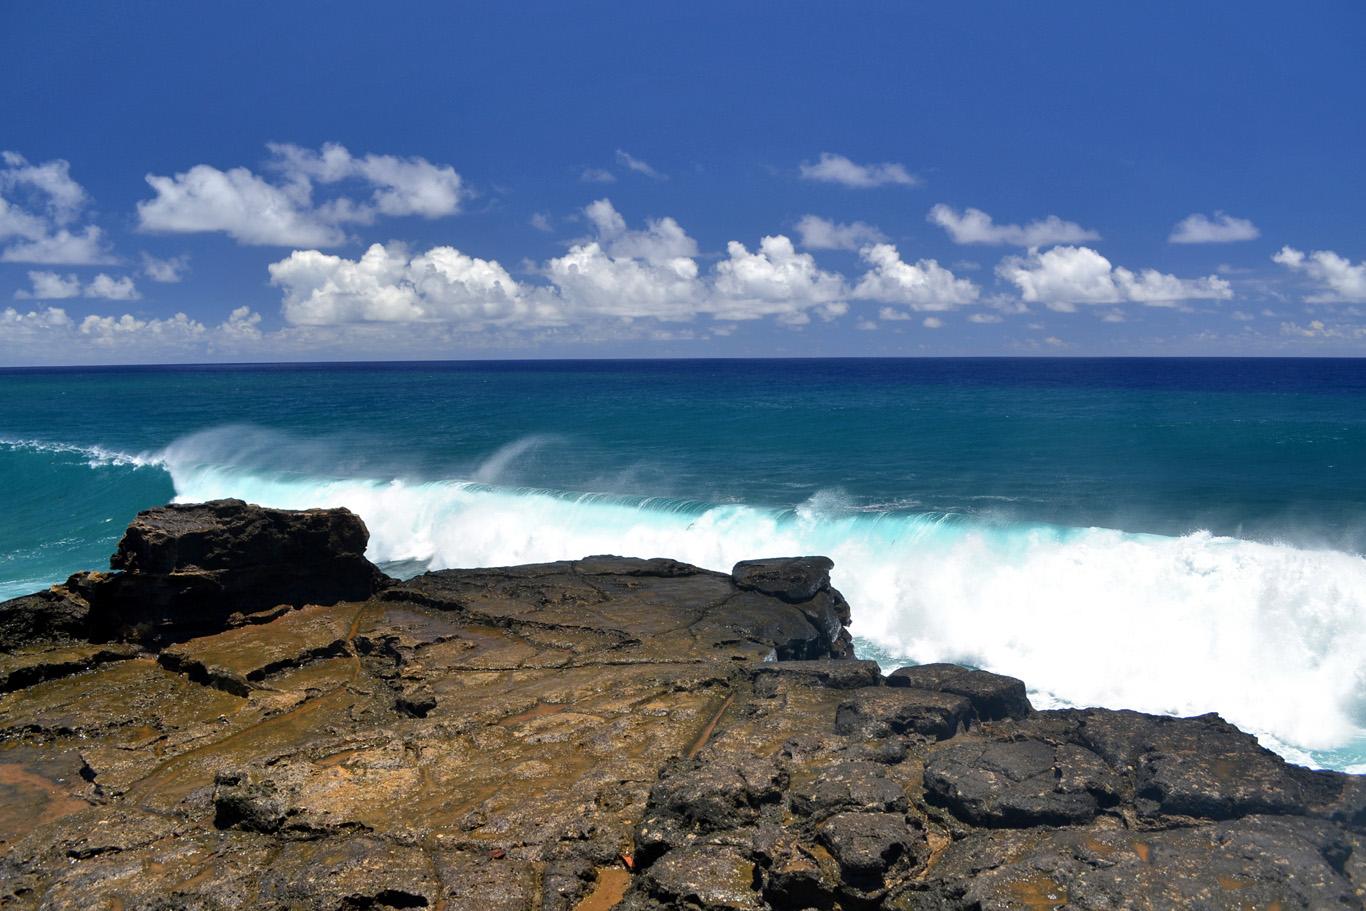 Waves at Gris Gris